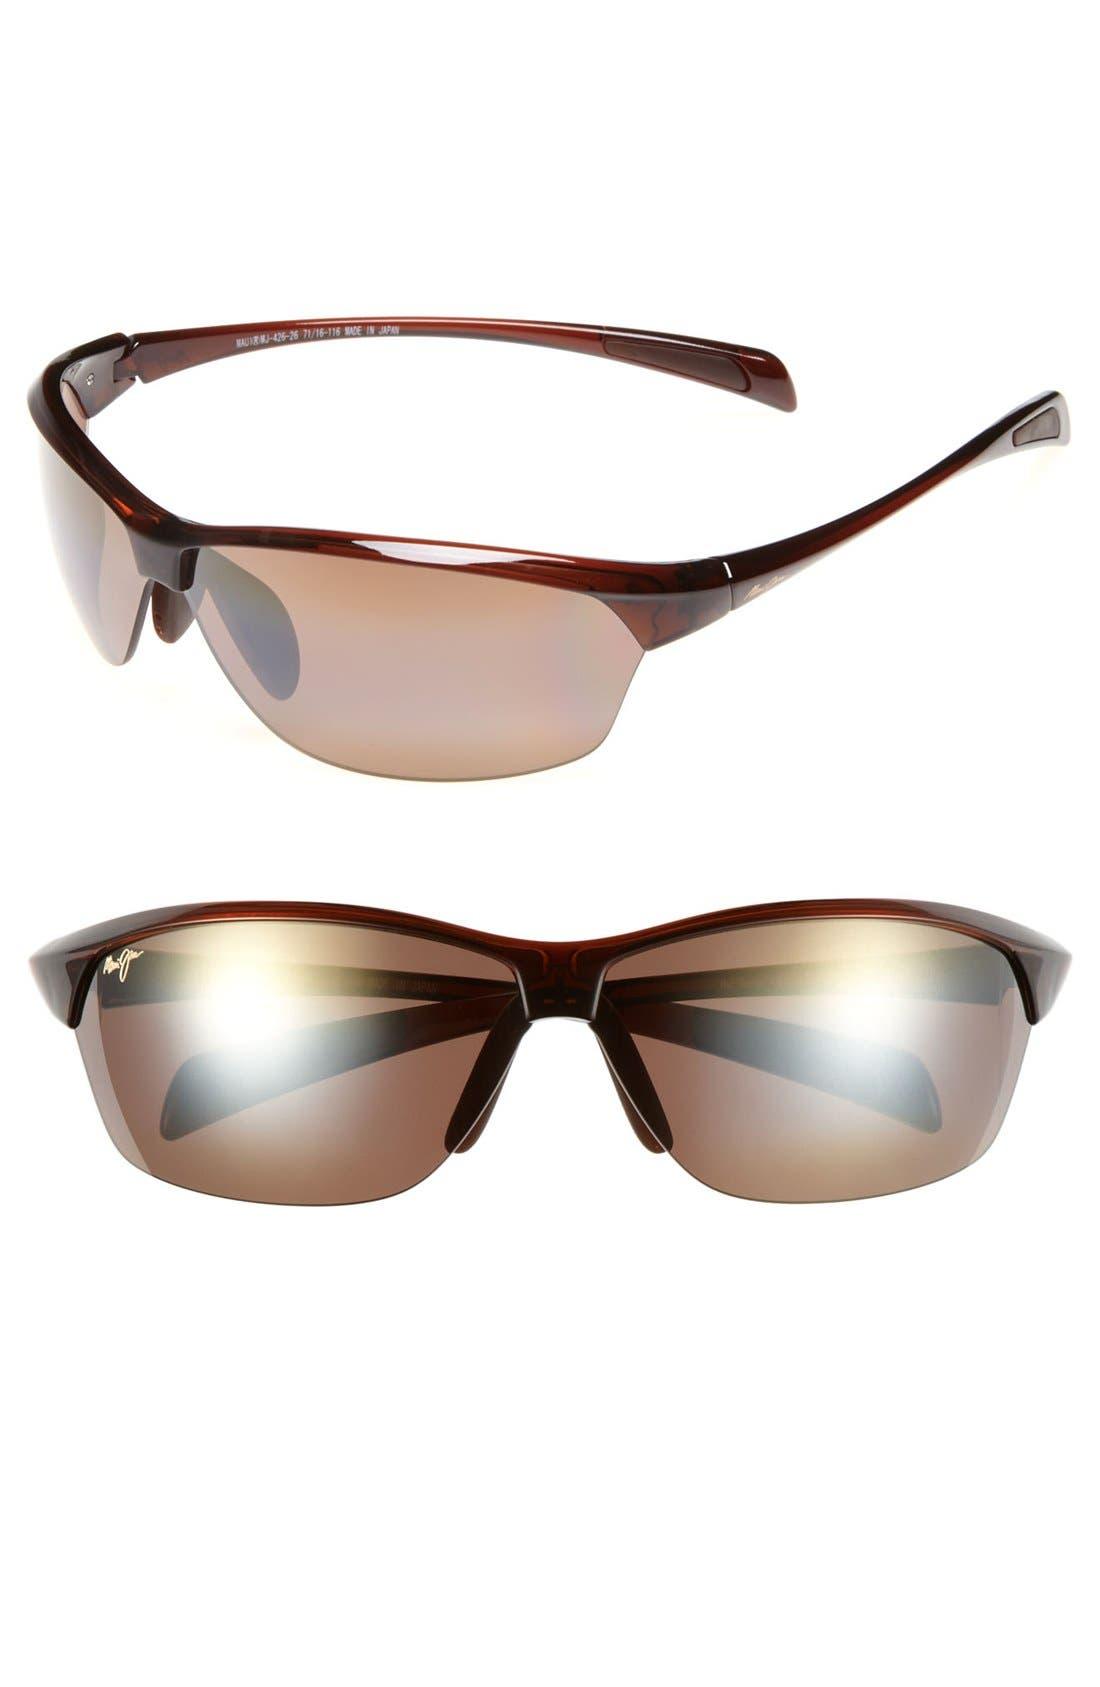 Maui Jim Hot Sands 71Mm Polarizedplus2 Sunglasses - Rootbeer